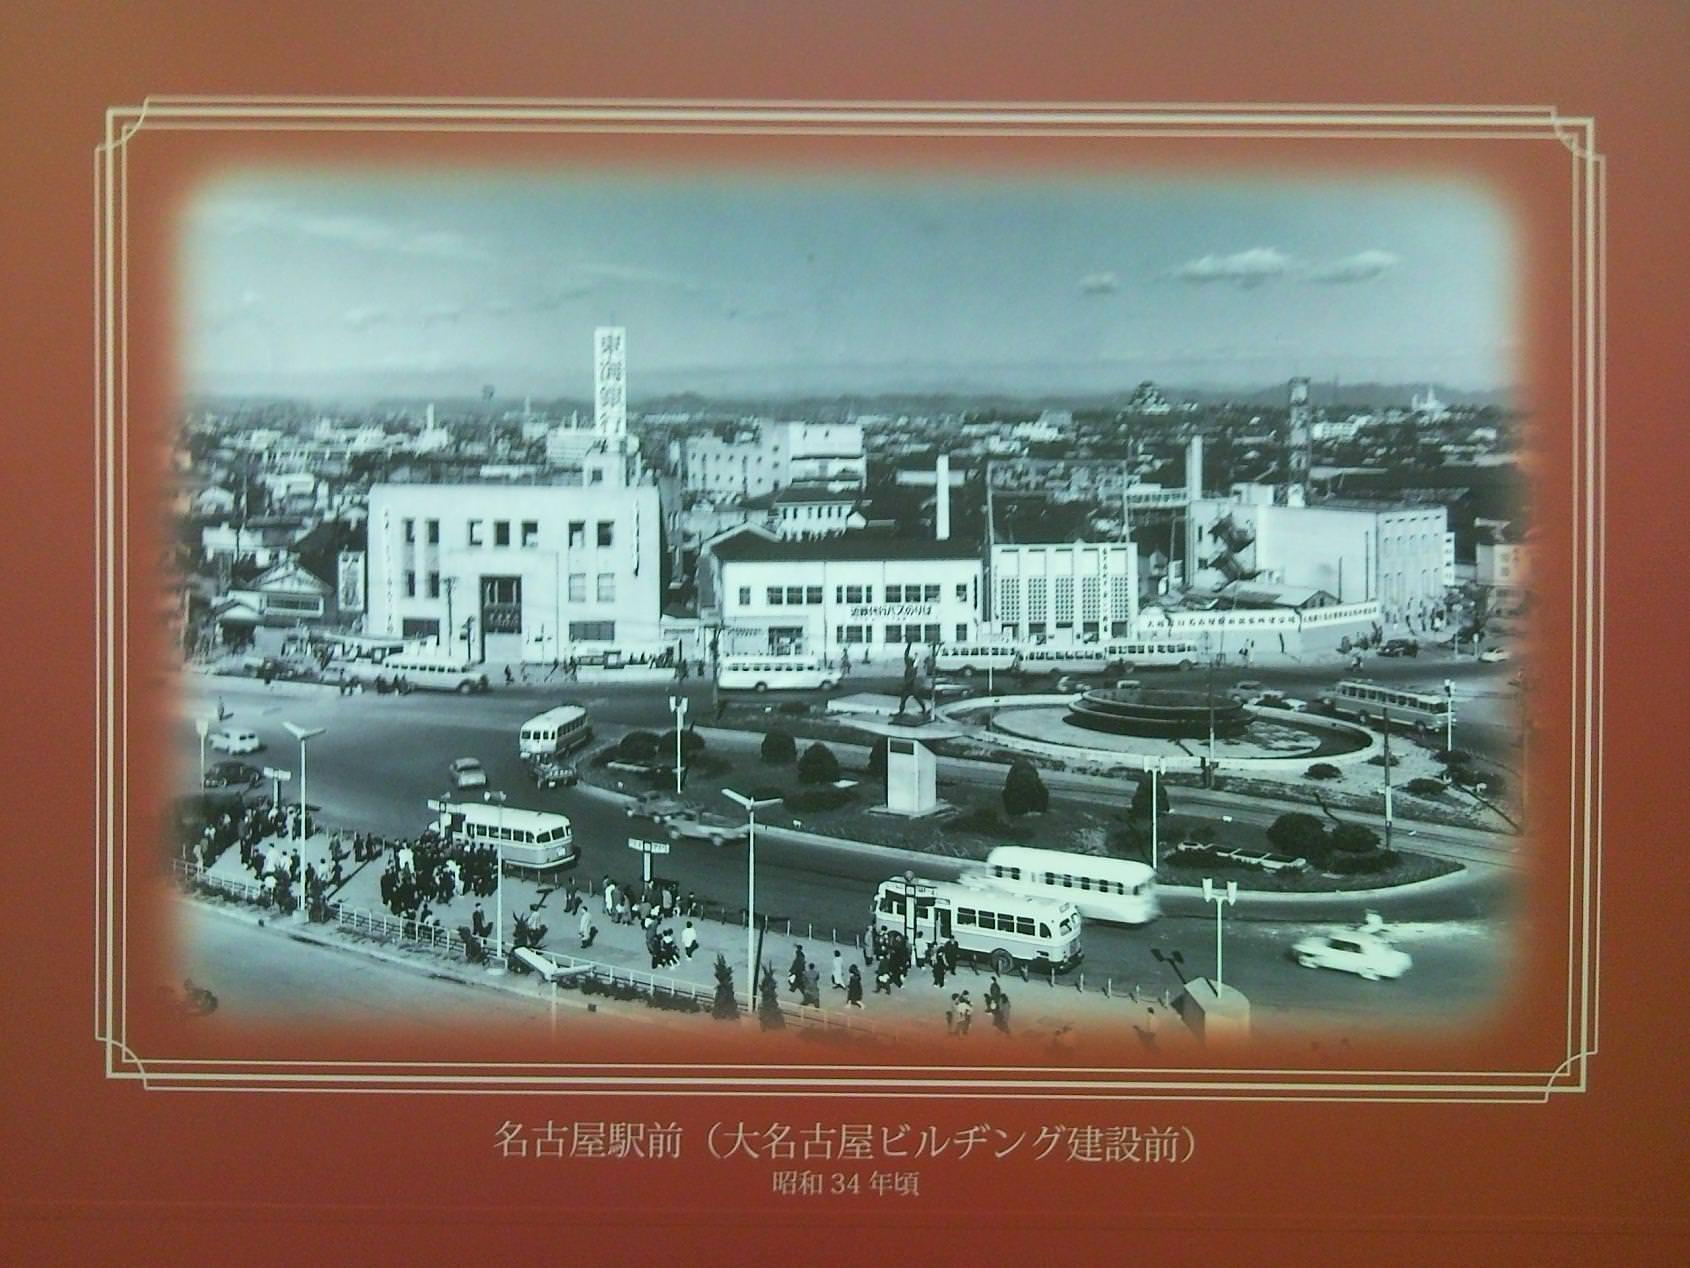 Nagoya Station (1957)   名古屋駅前 昭和34年